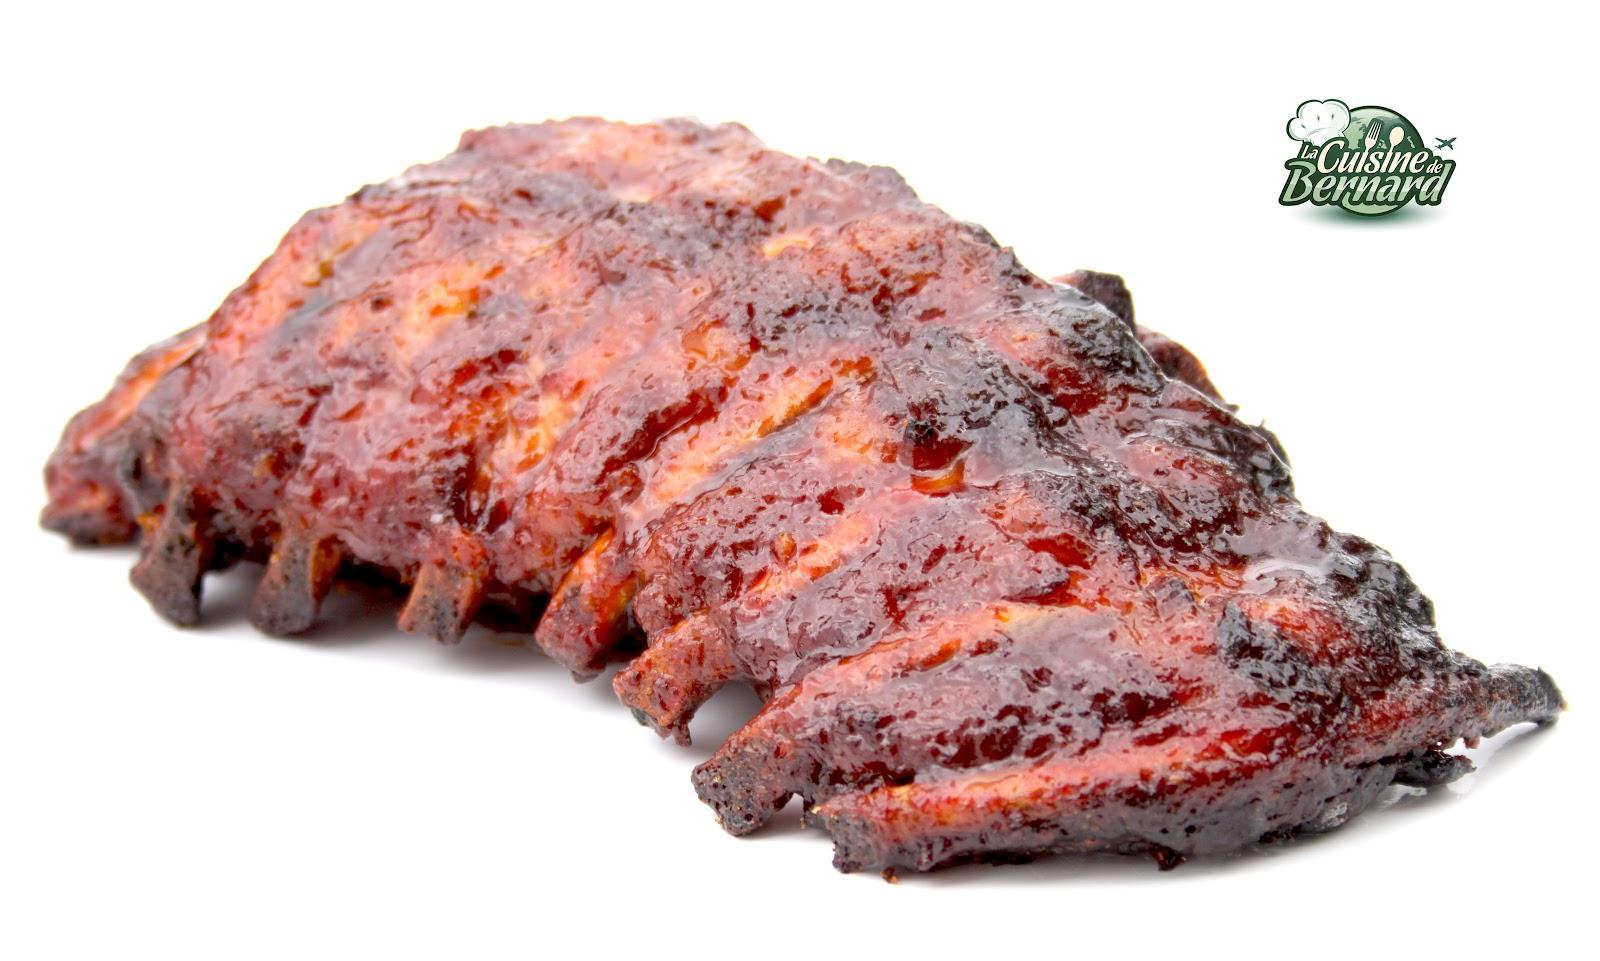 La cuisine de bernard travers de porc grill s sauce barbecue - Comment faire prendre un barbecue ...